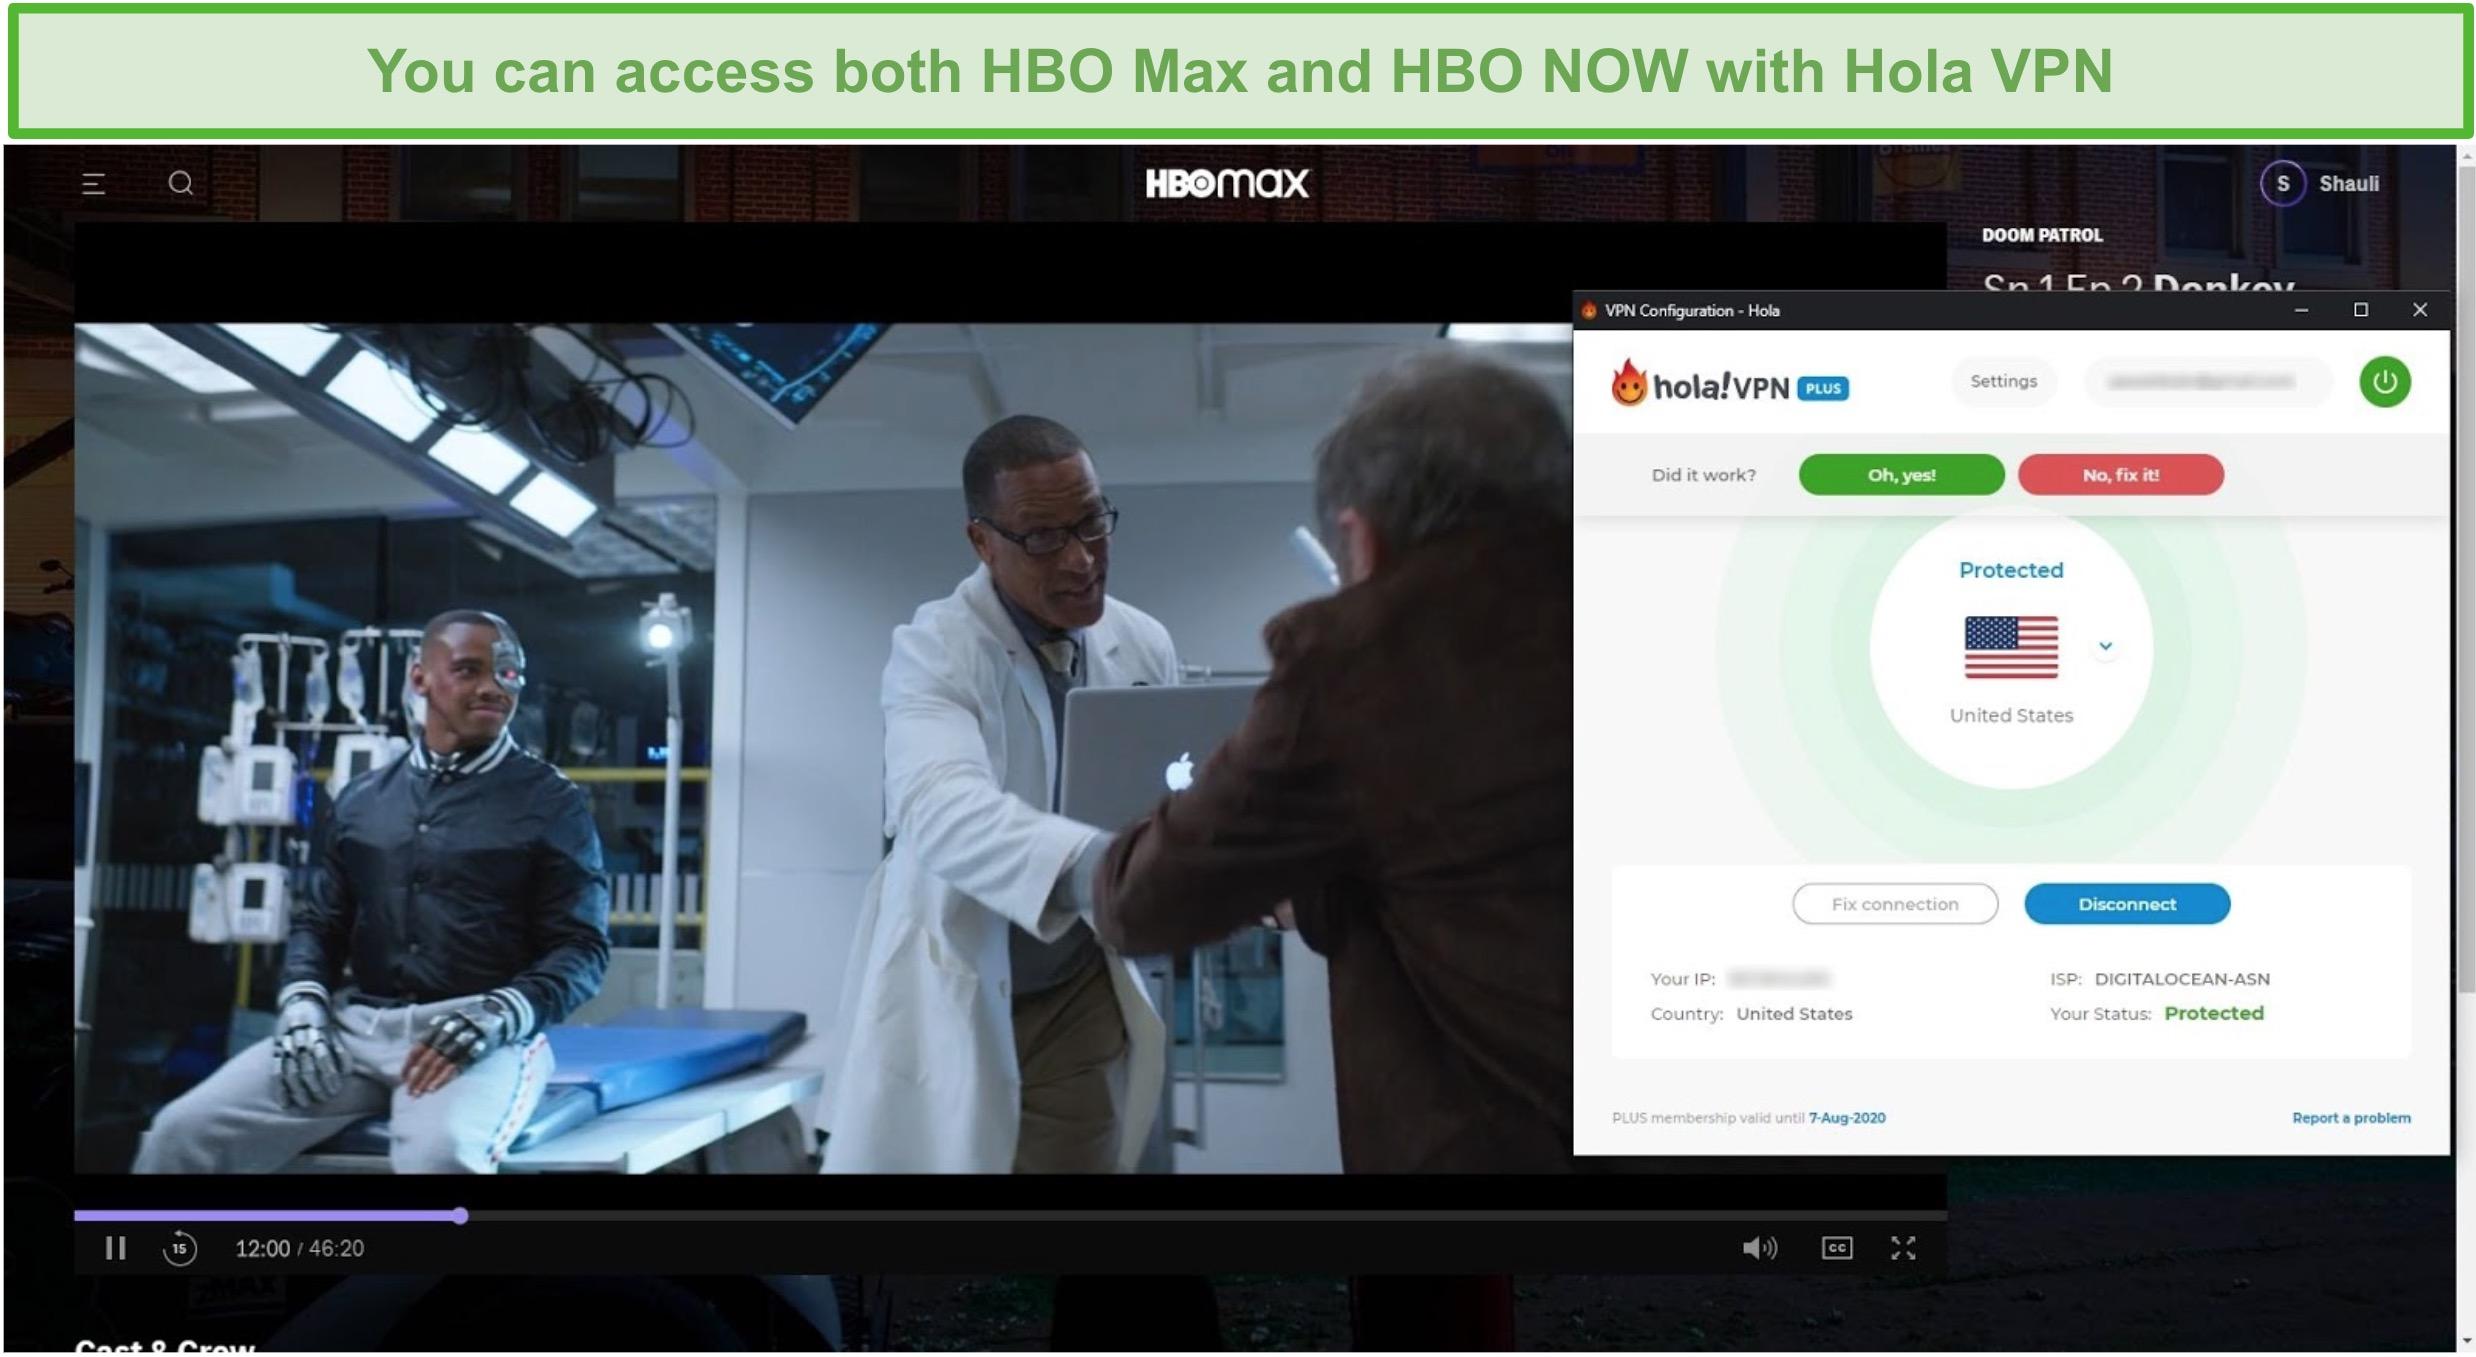 Screenshot of Hola VPN unblocking Doom Patrol on HBO Max.